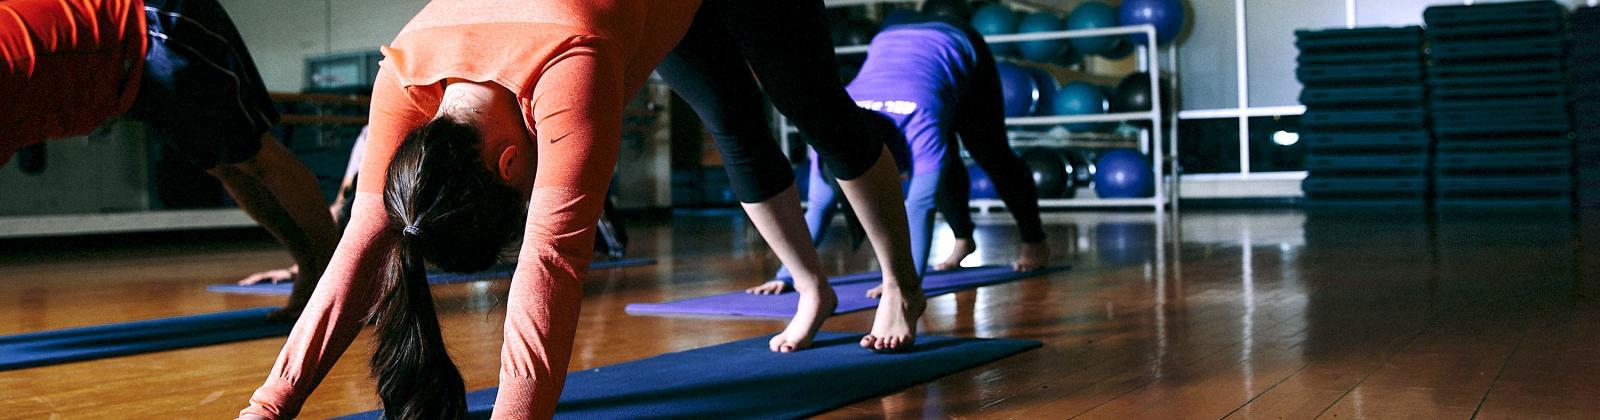 Student stretching on yoga mats